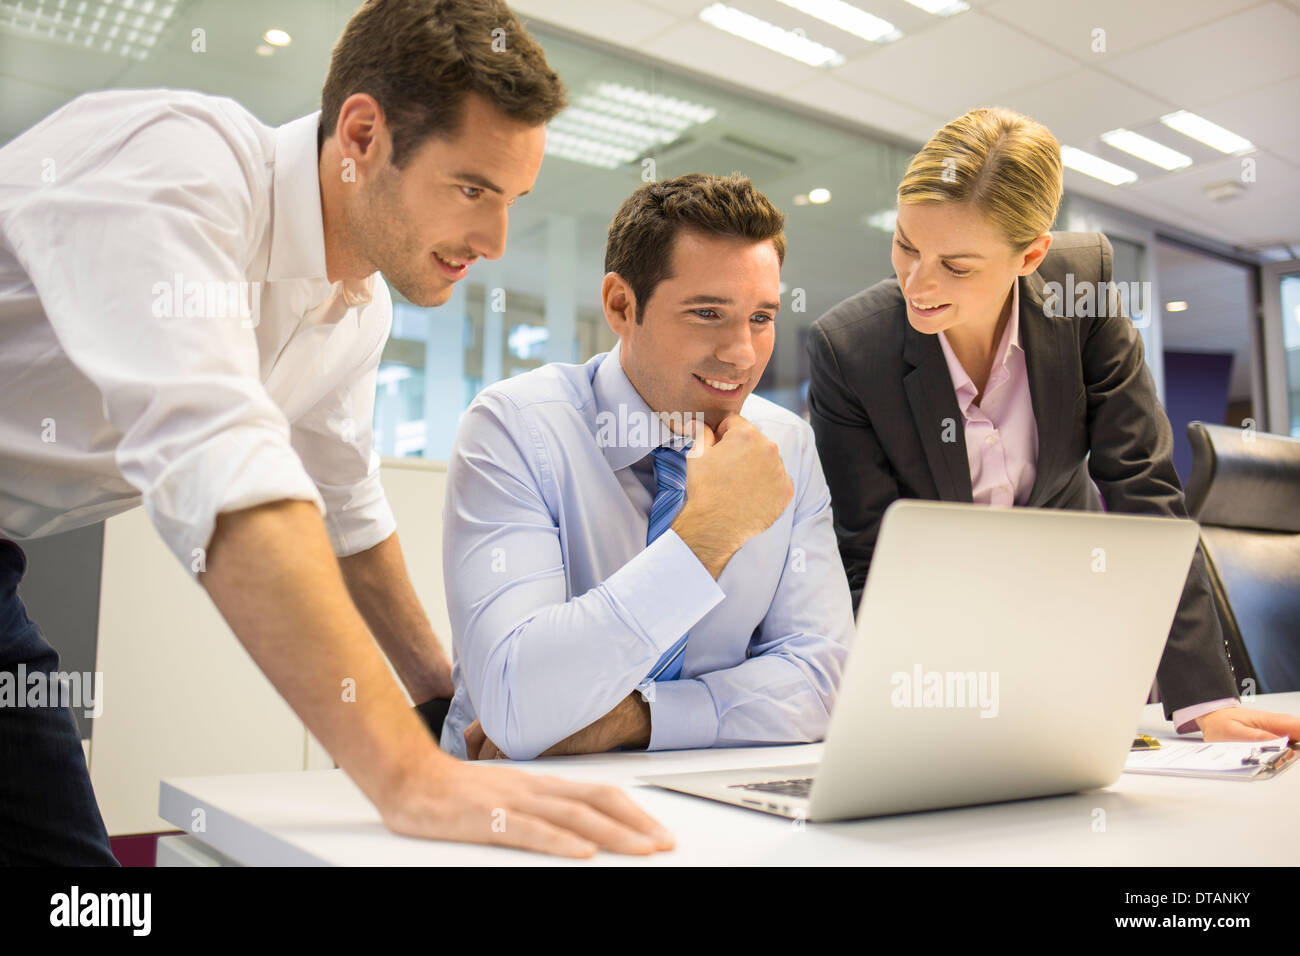 Equipo masculino femenino mesa de trabajo coworking Imagen De Stock